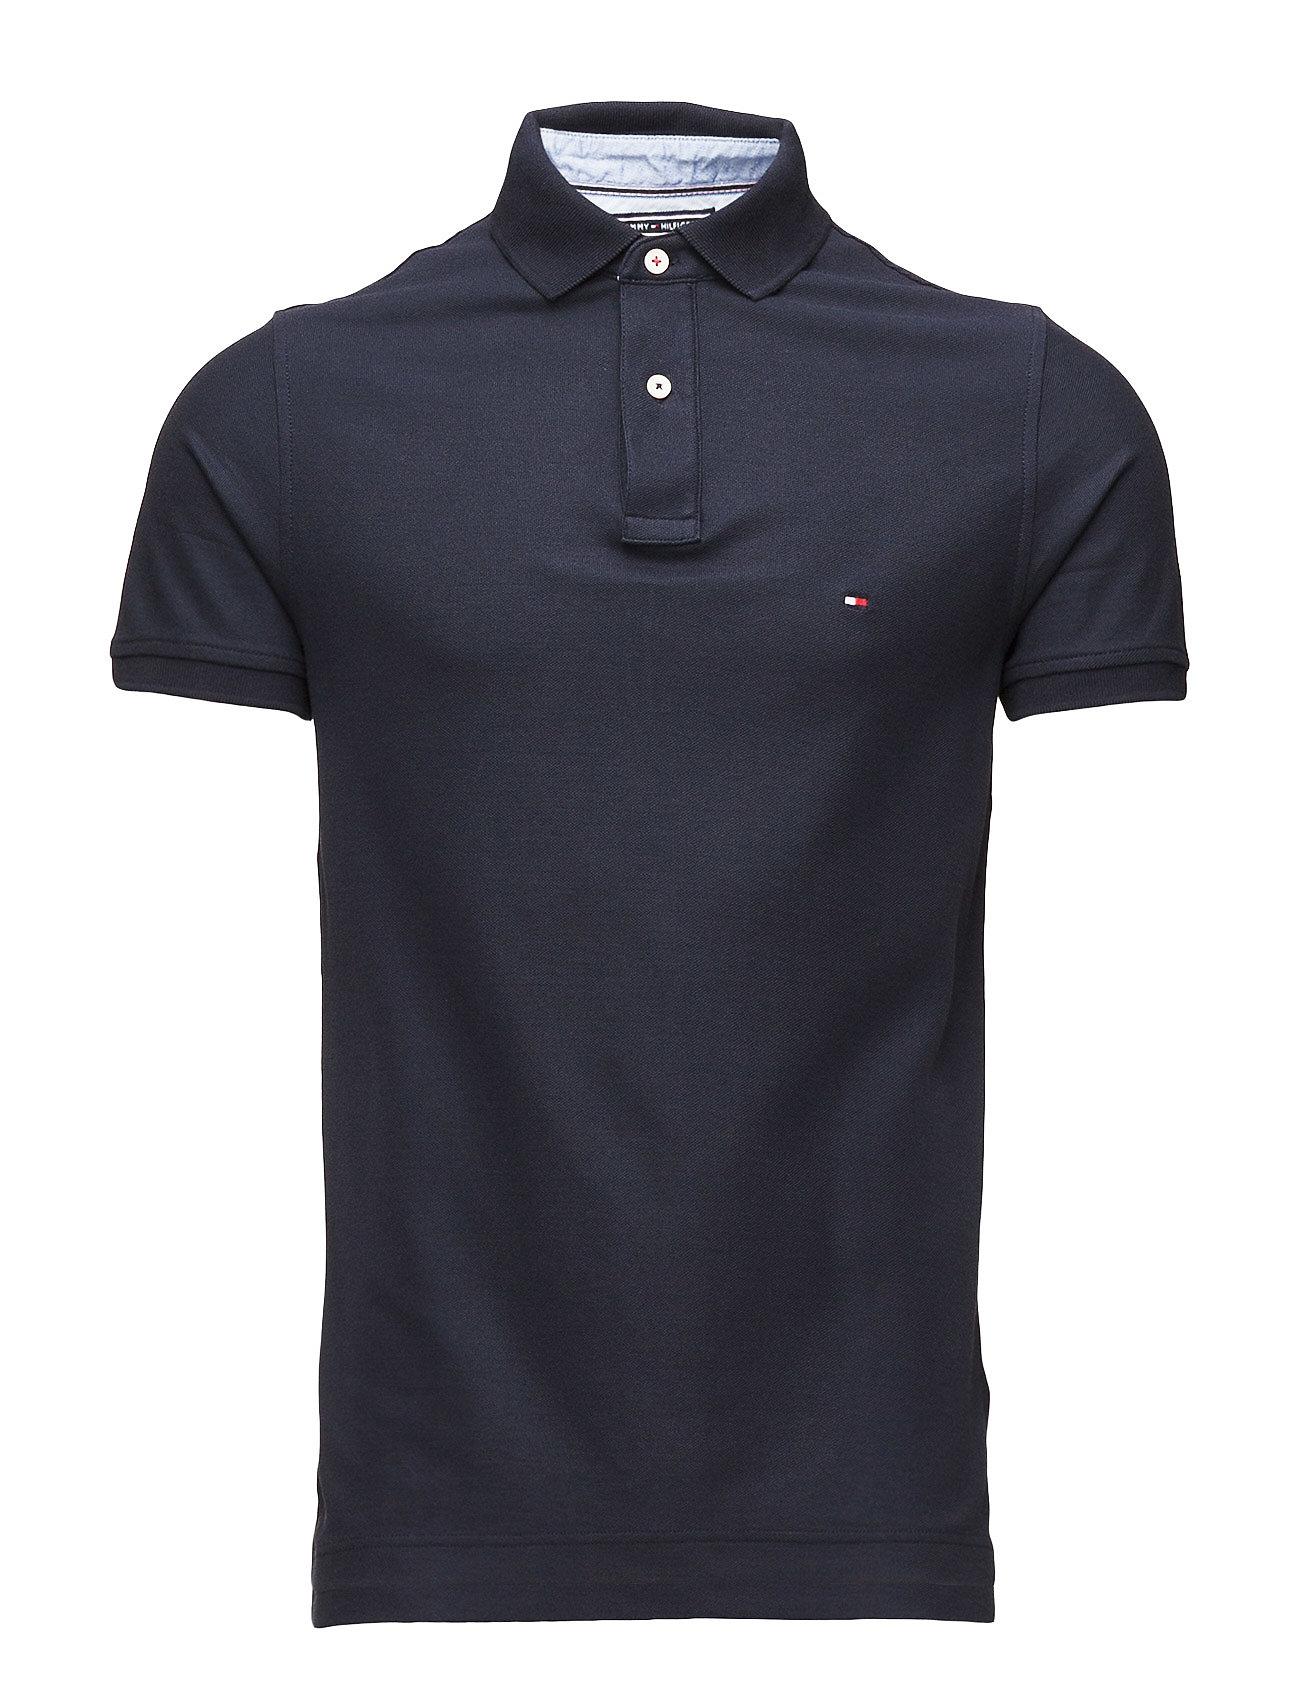 Image of Core Hilfiger Slim Polo Polos Short-sleeved Blå Tommy Hilfiger (3452102479)